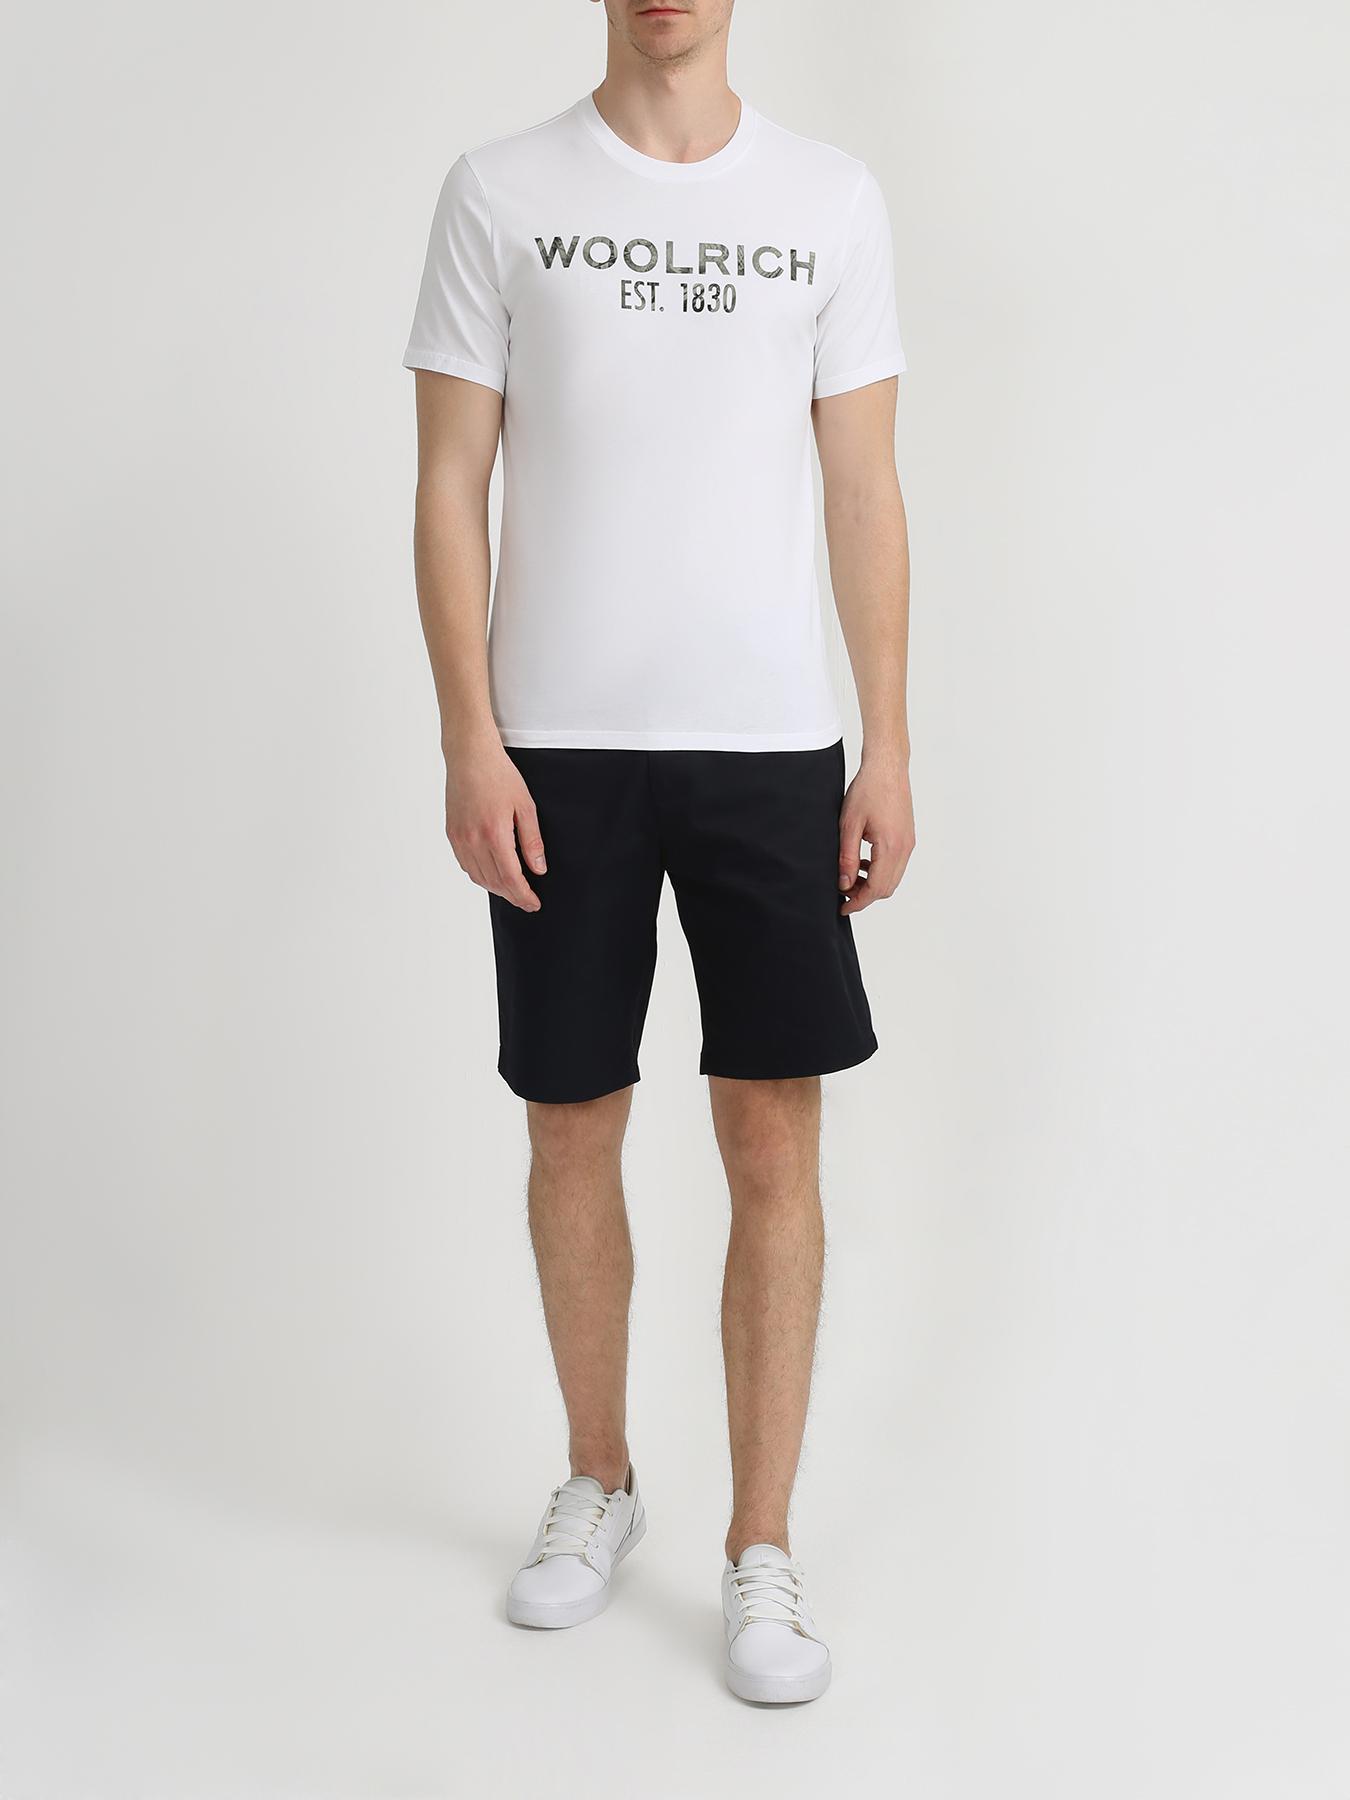 Woolrich Хлопковая футболка 345682-045